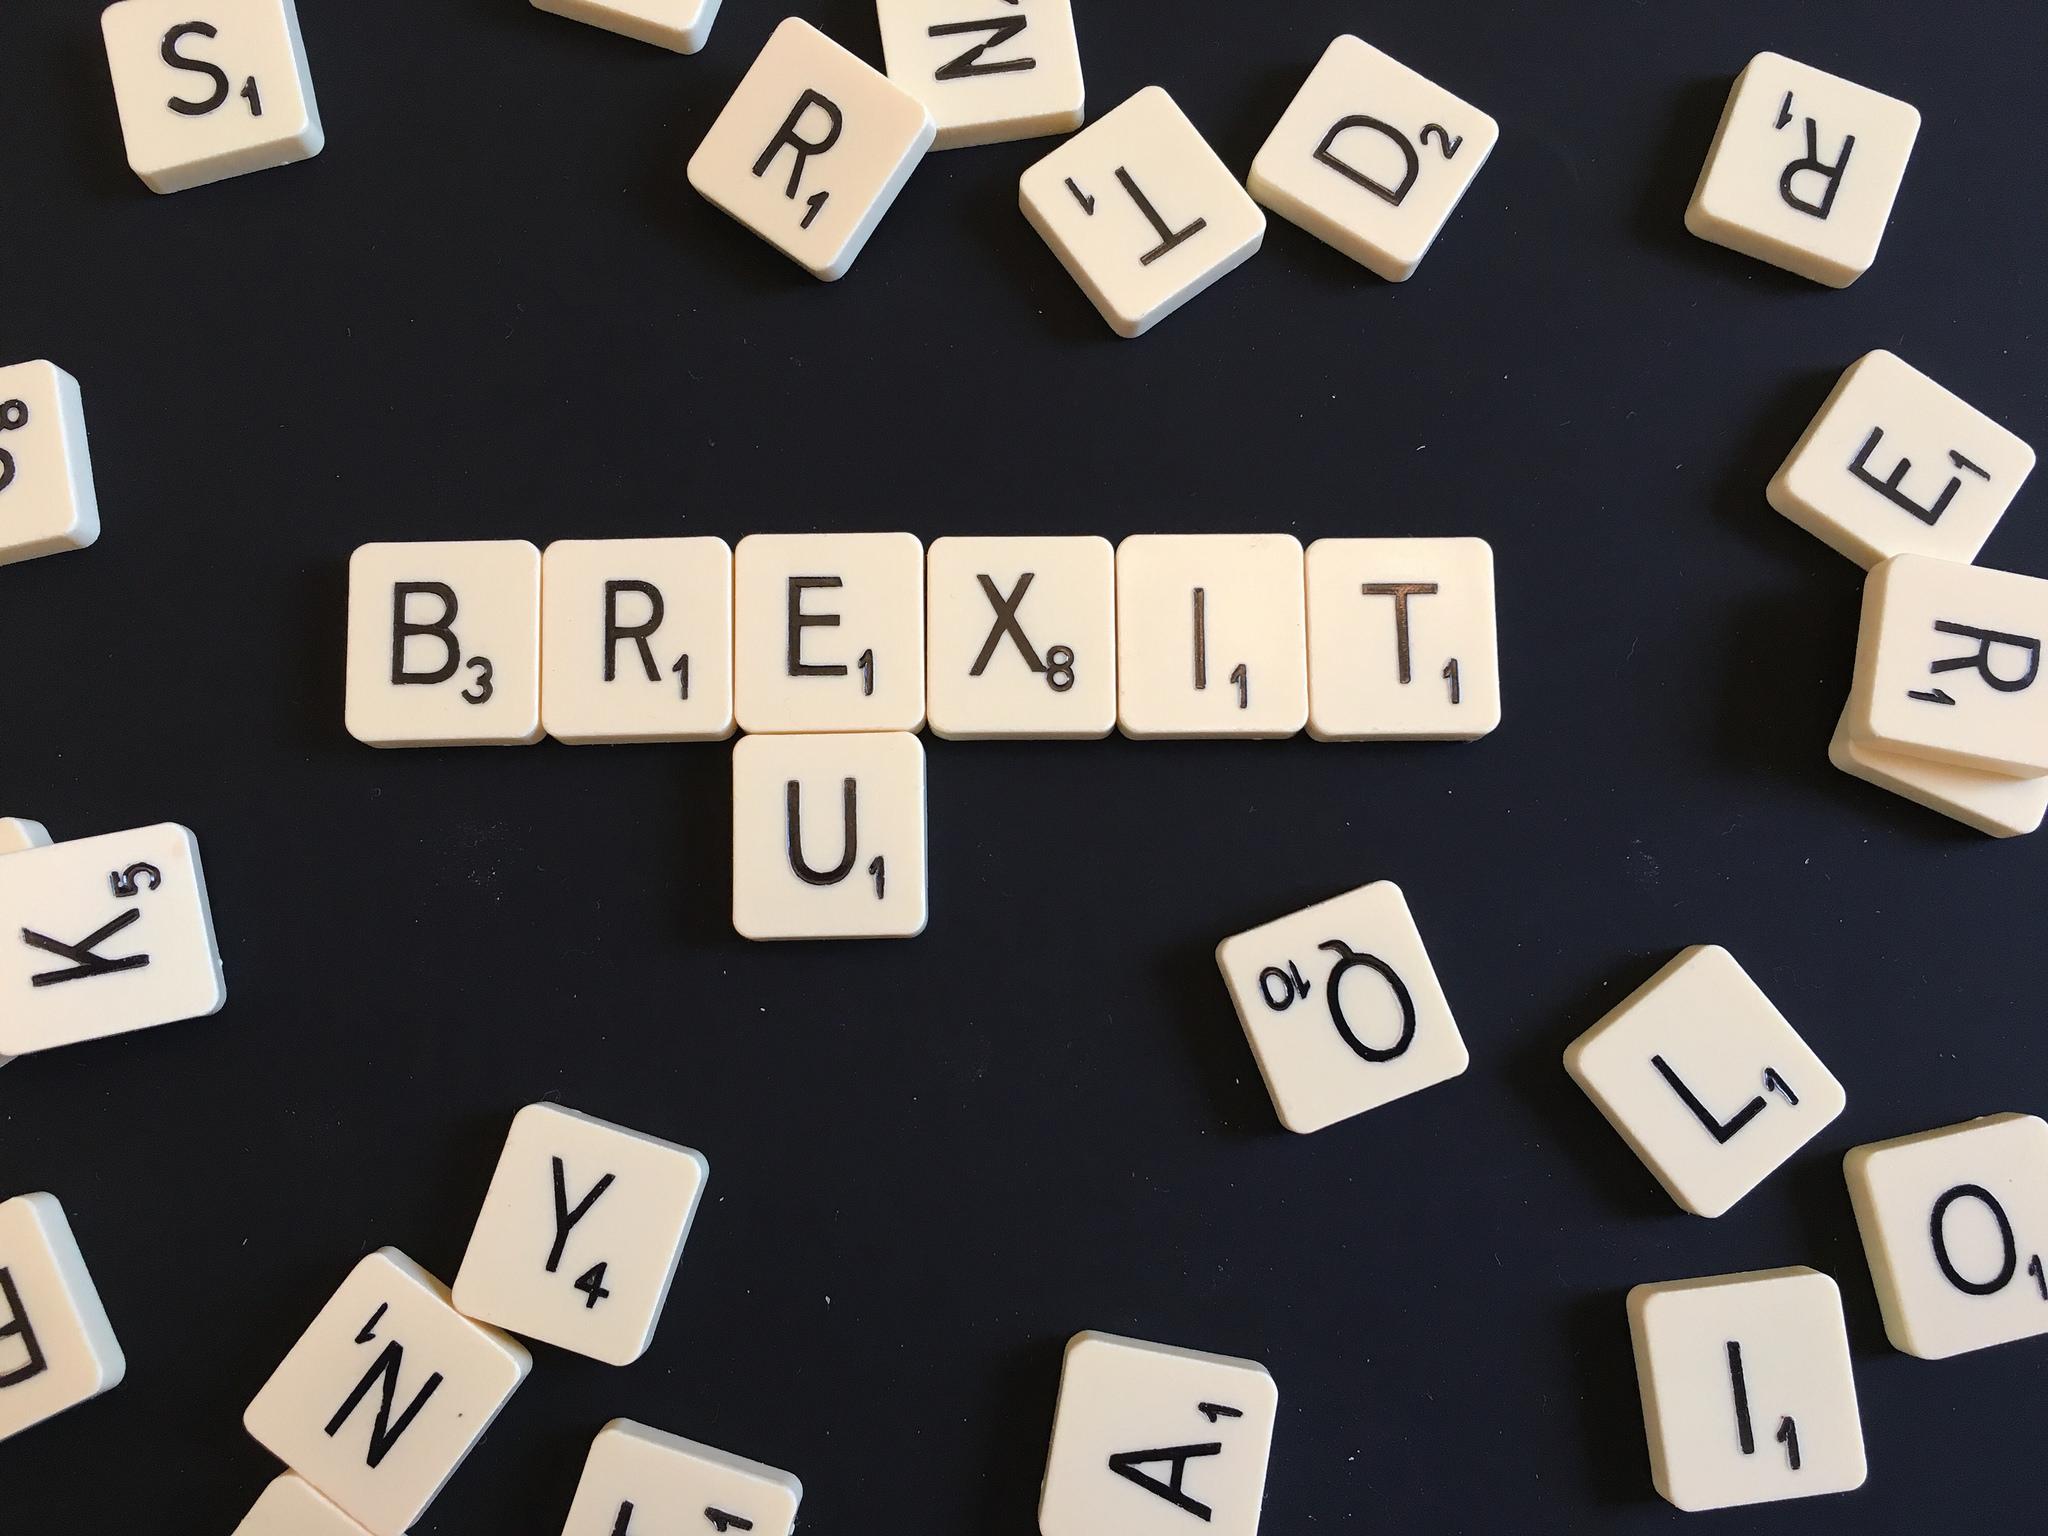 Foto: Brexit / EU Scrabble (Jeff Djevdet/flickr.com; Lizenz: CC BY 2.0) speedpropertybuyers.co.uk/